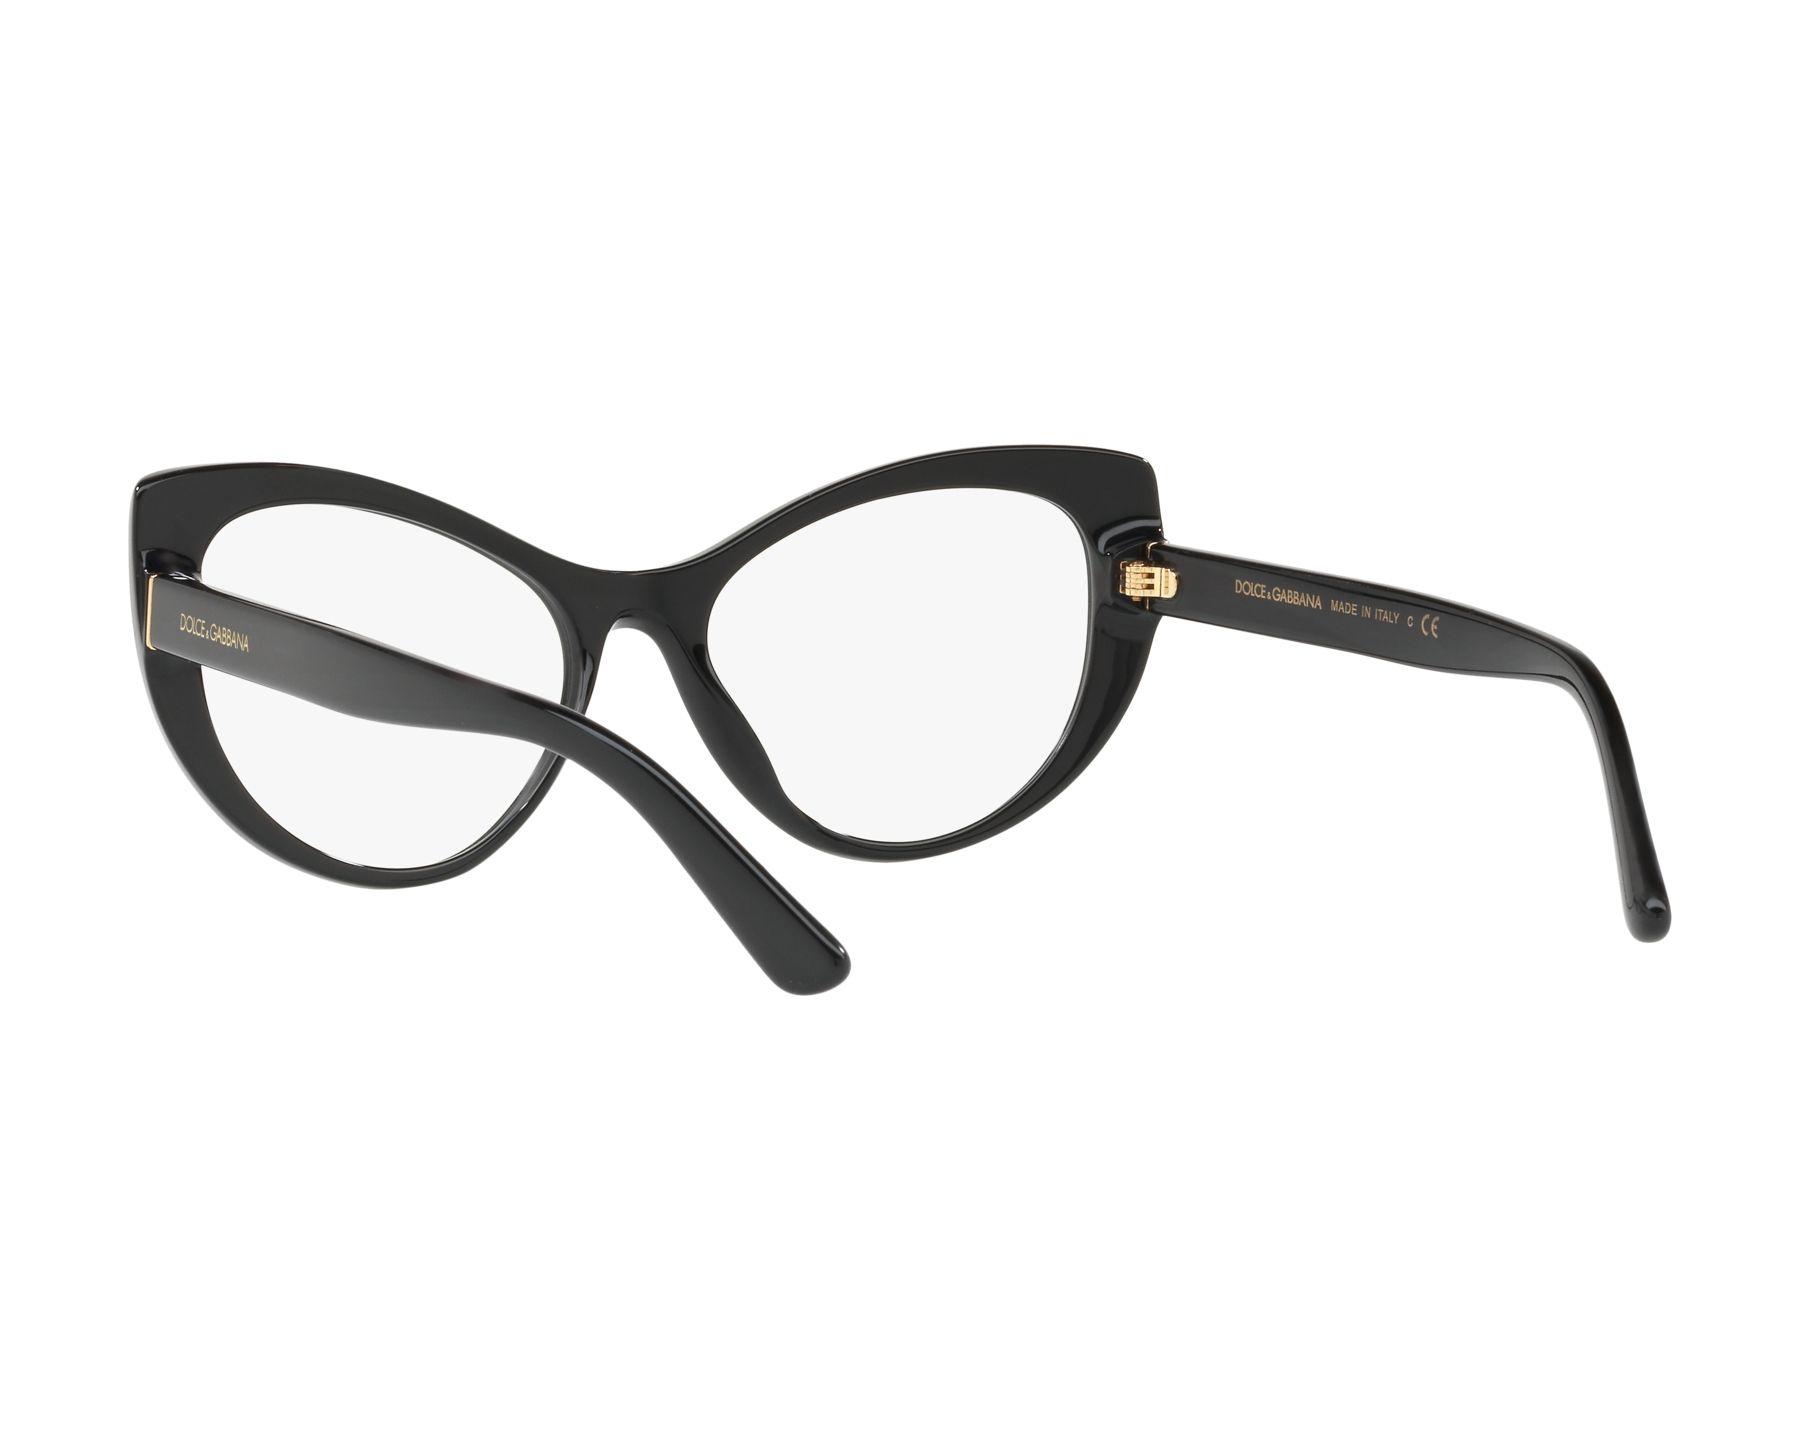 5471b8527c84 eyeglasses Dolce   Gabbana DG-3285 501 52-17 Black 360 degree view 6